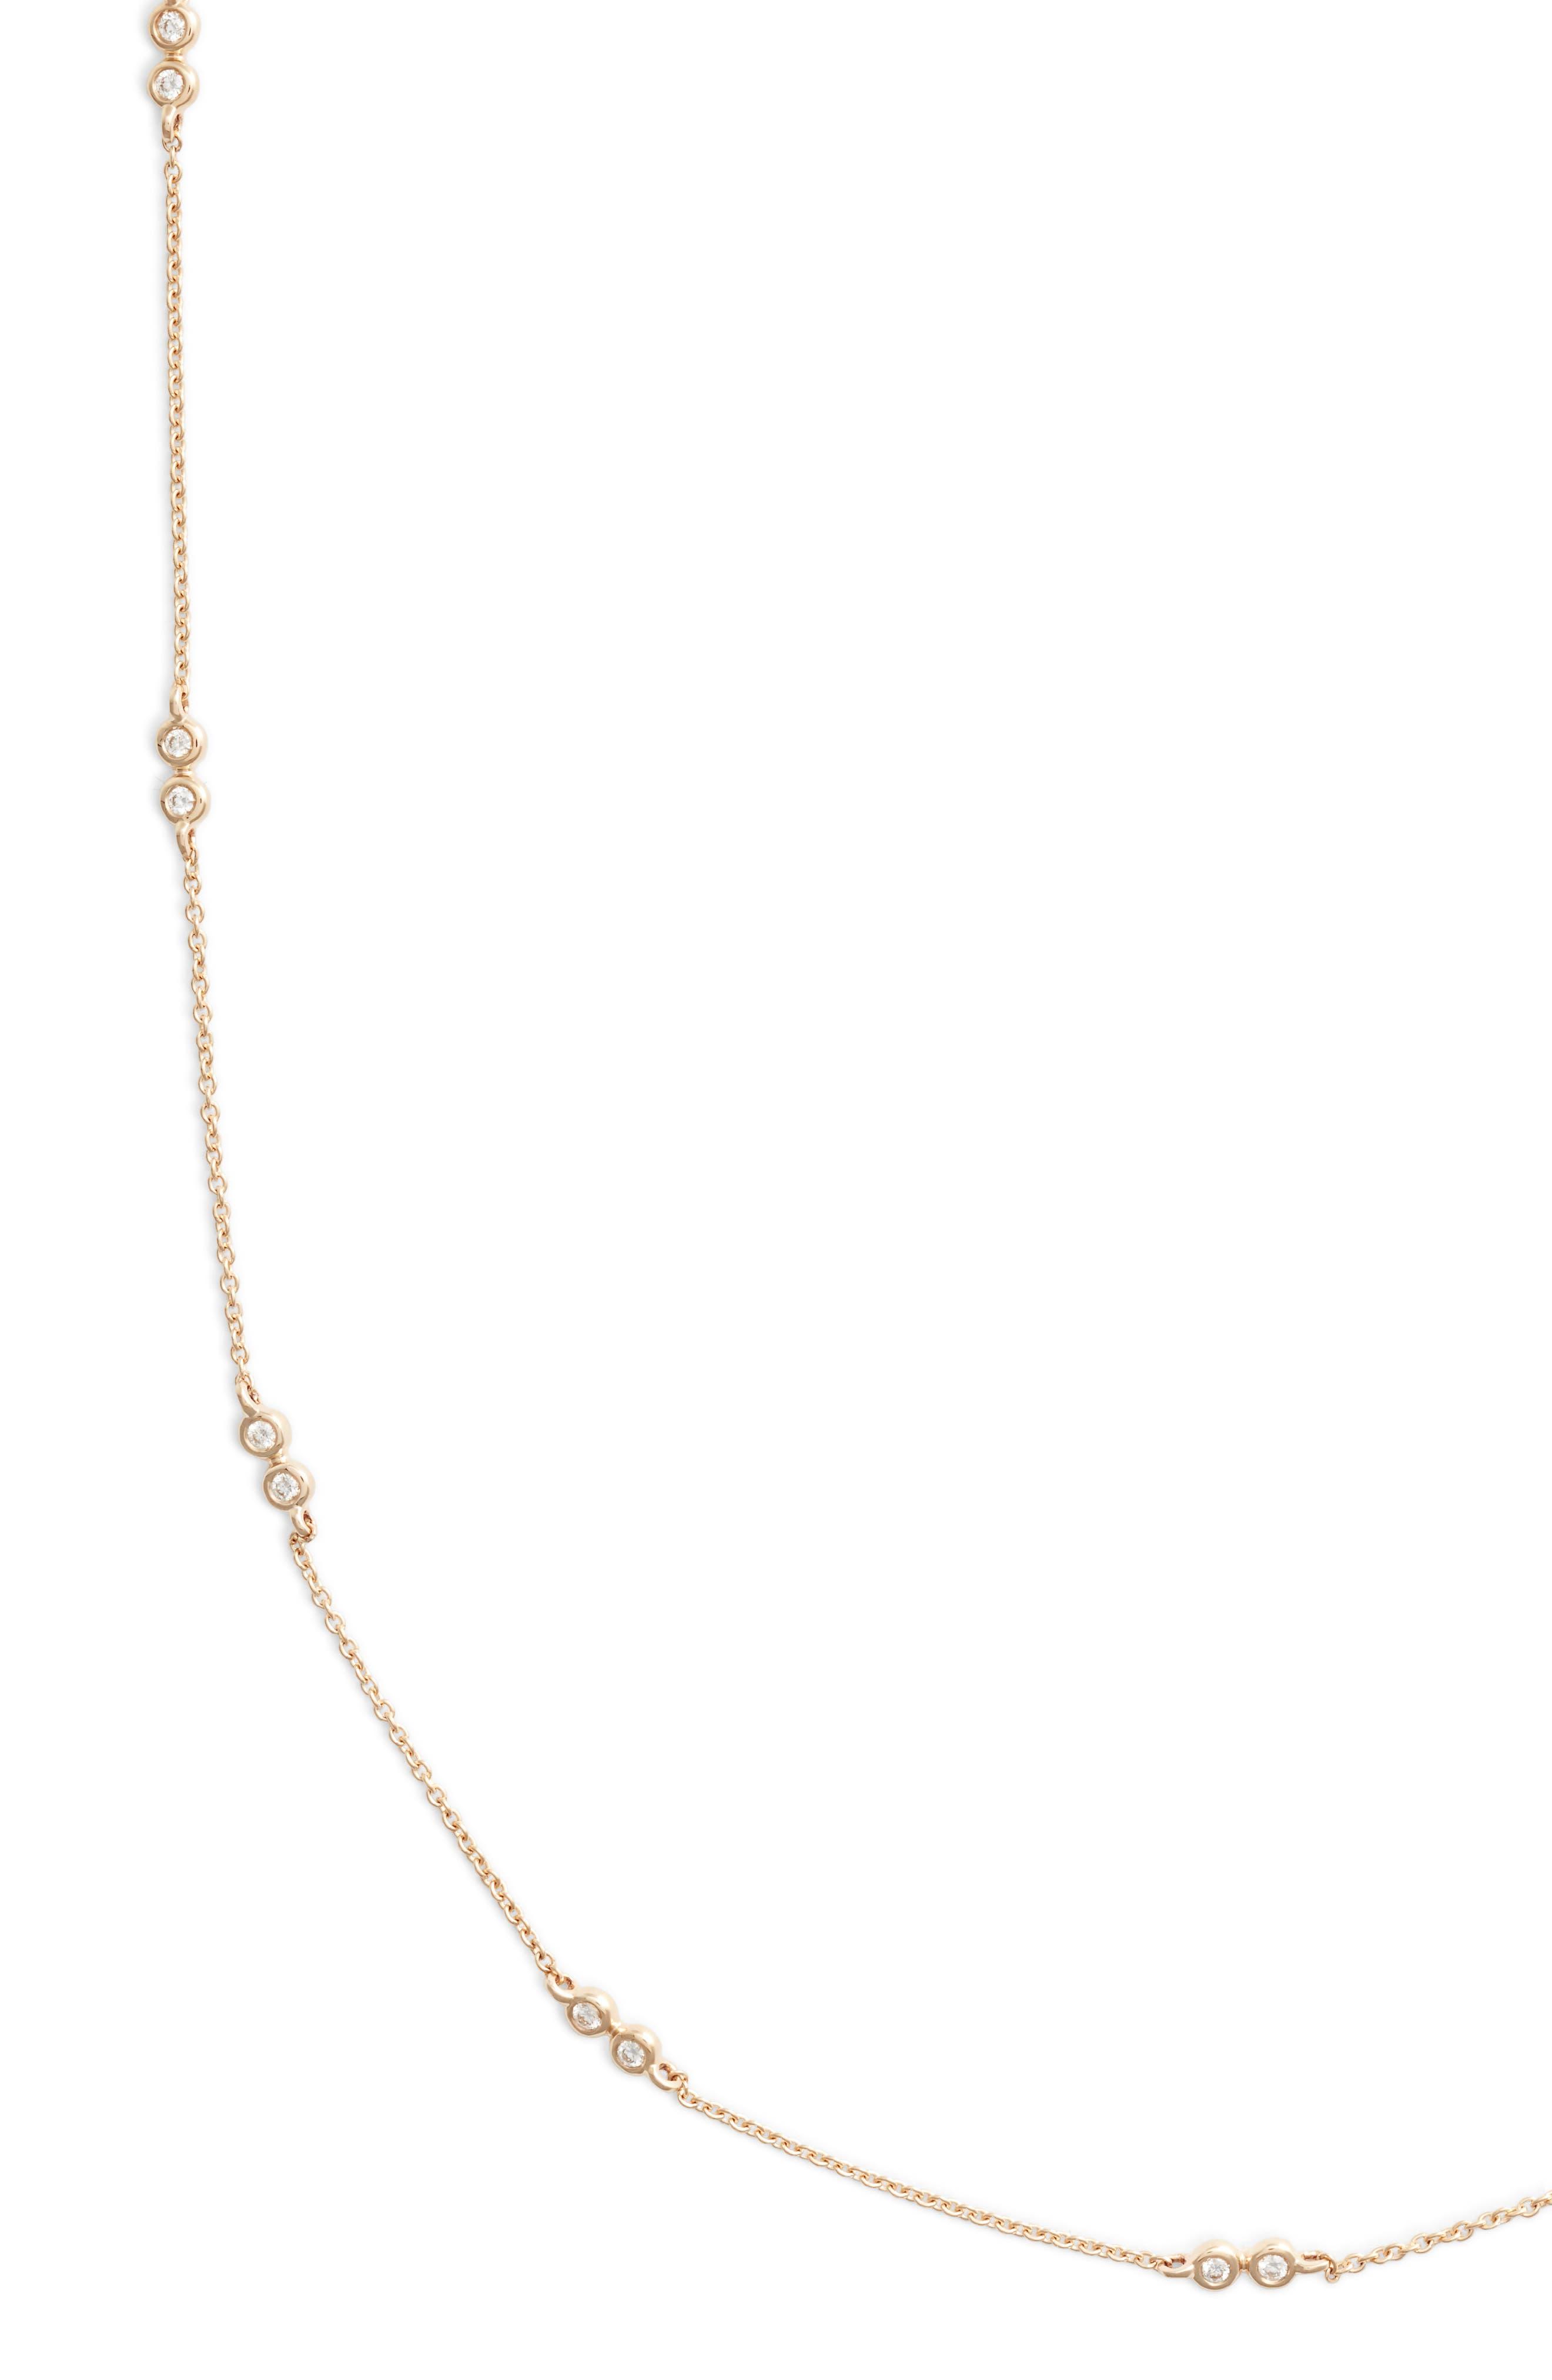 Lulu Jack Diamond Station Necklace,                         Main,                         color, Yellow Gold